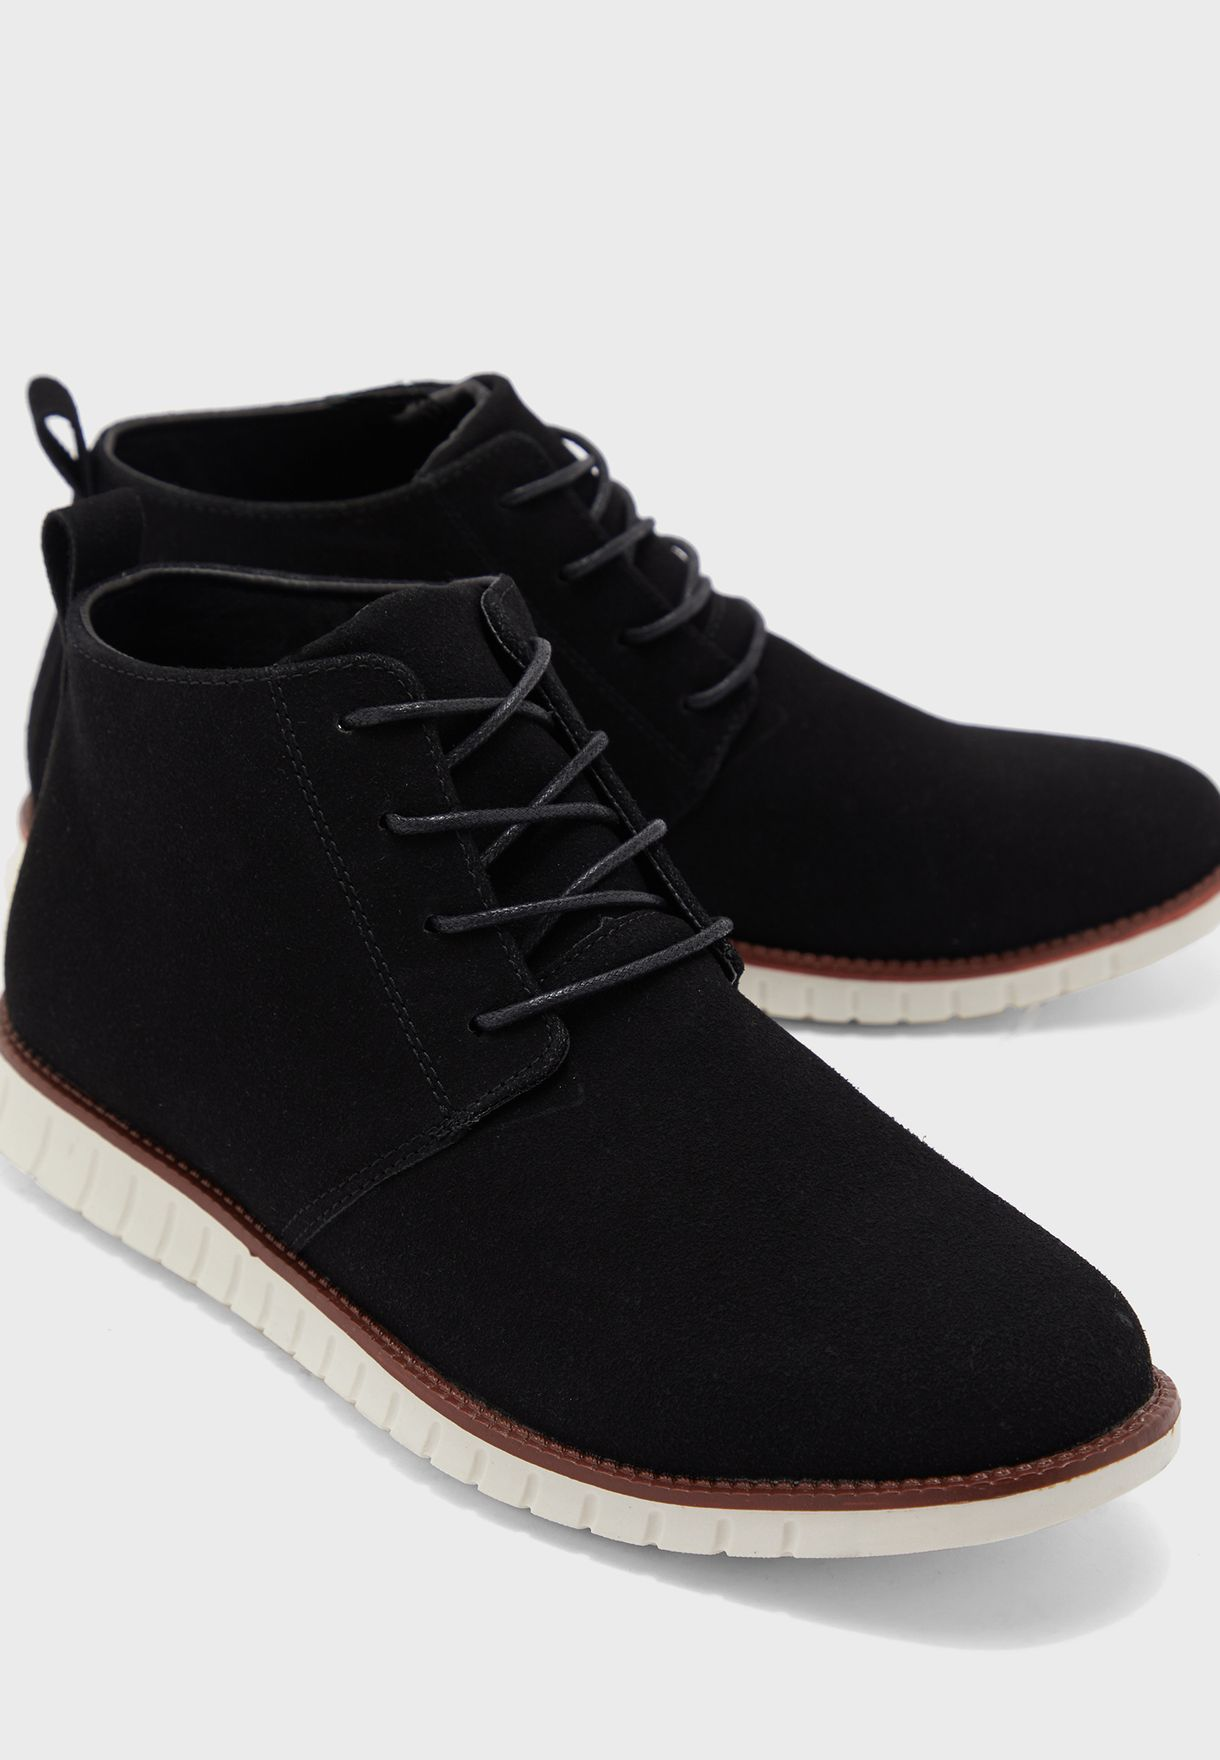 Casual Chukka Boot